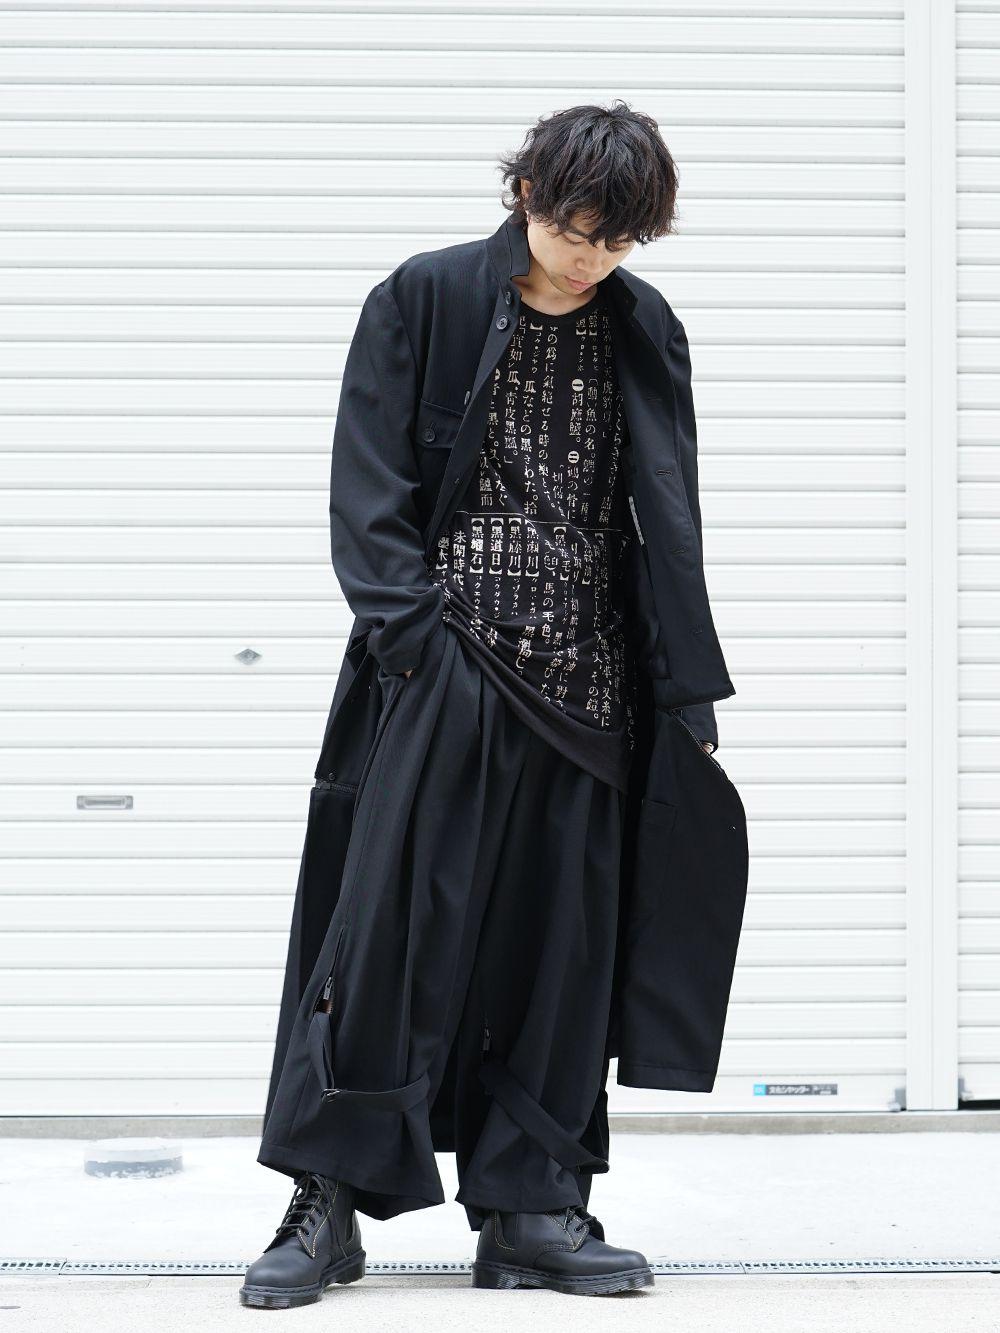 Yohji Yamamoto 19-20AW New Arrival - 1-001